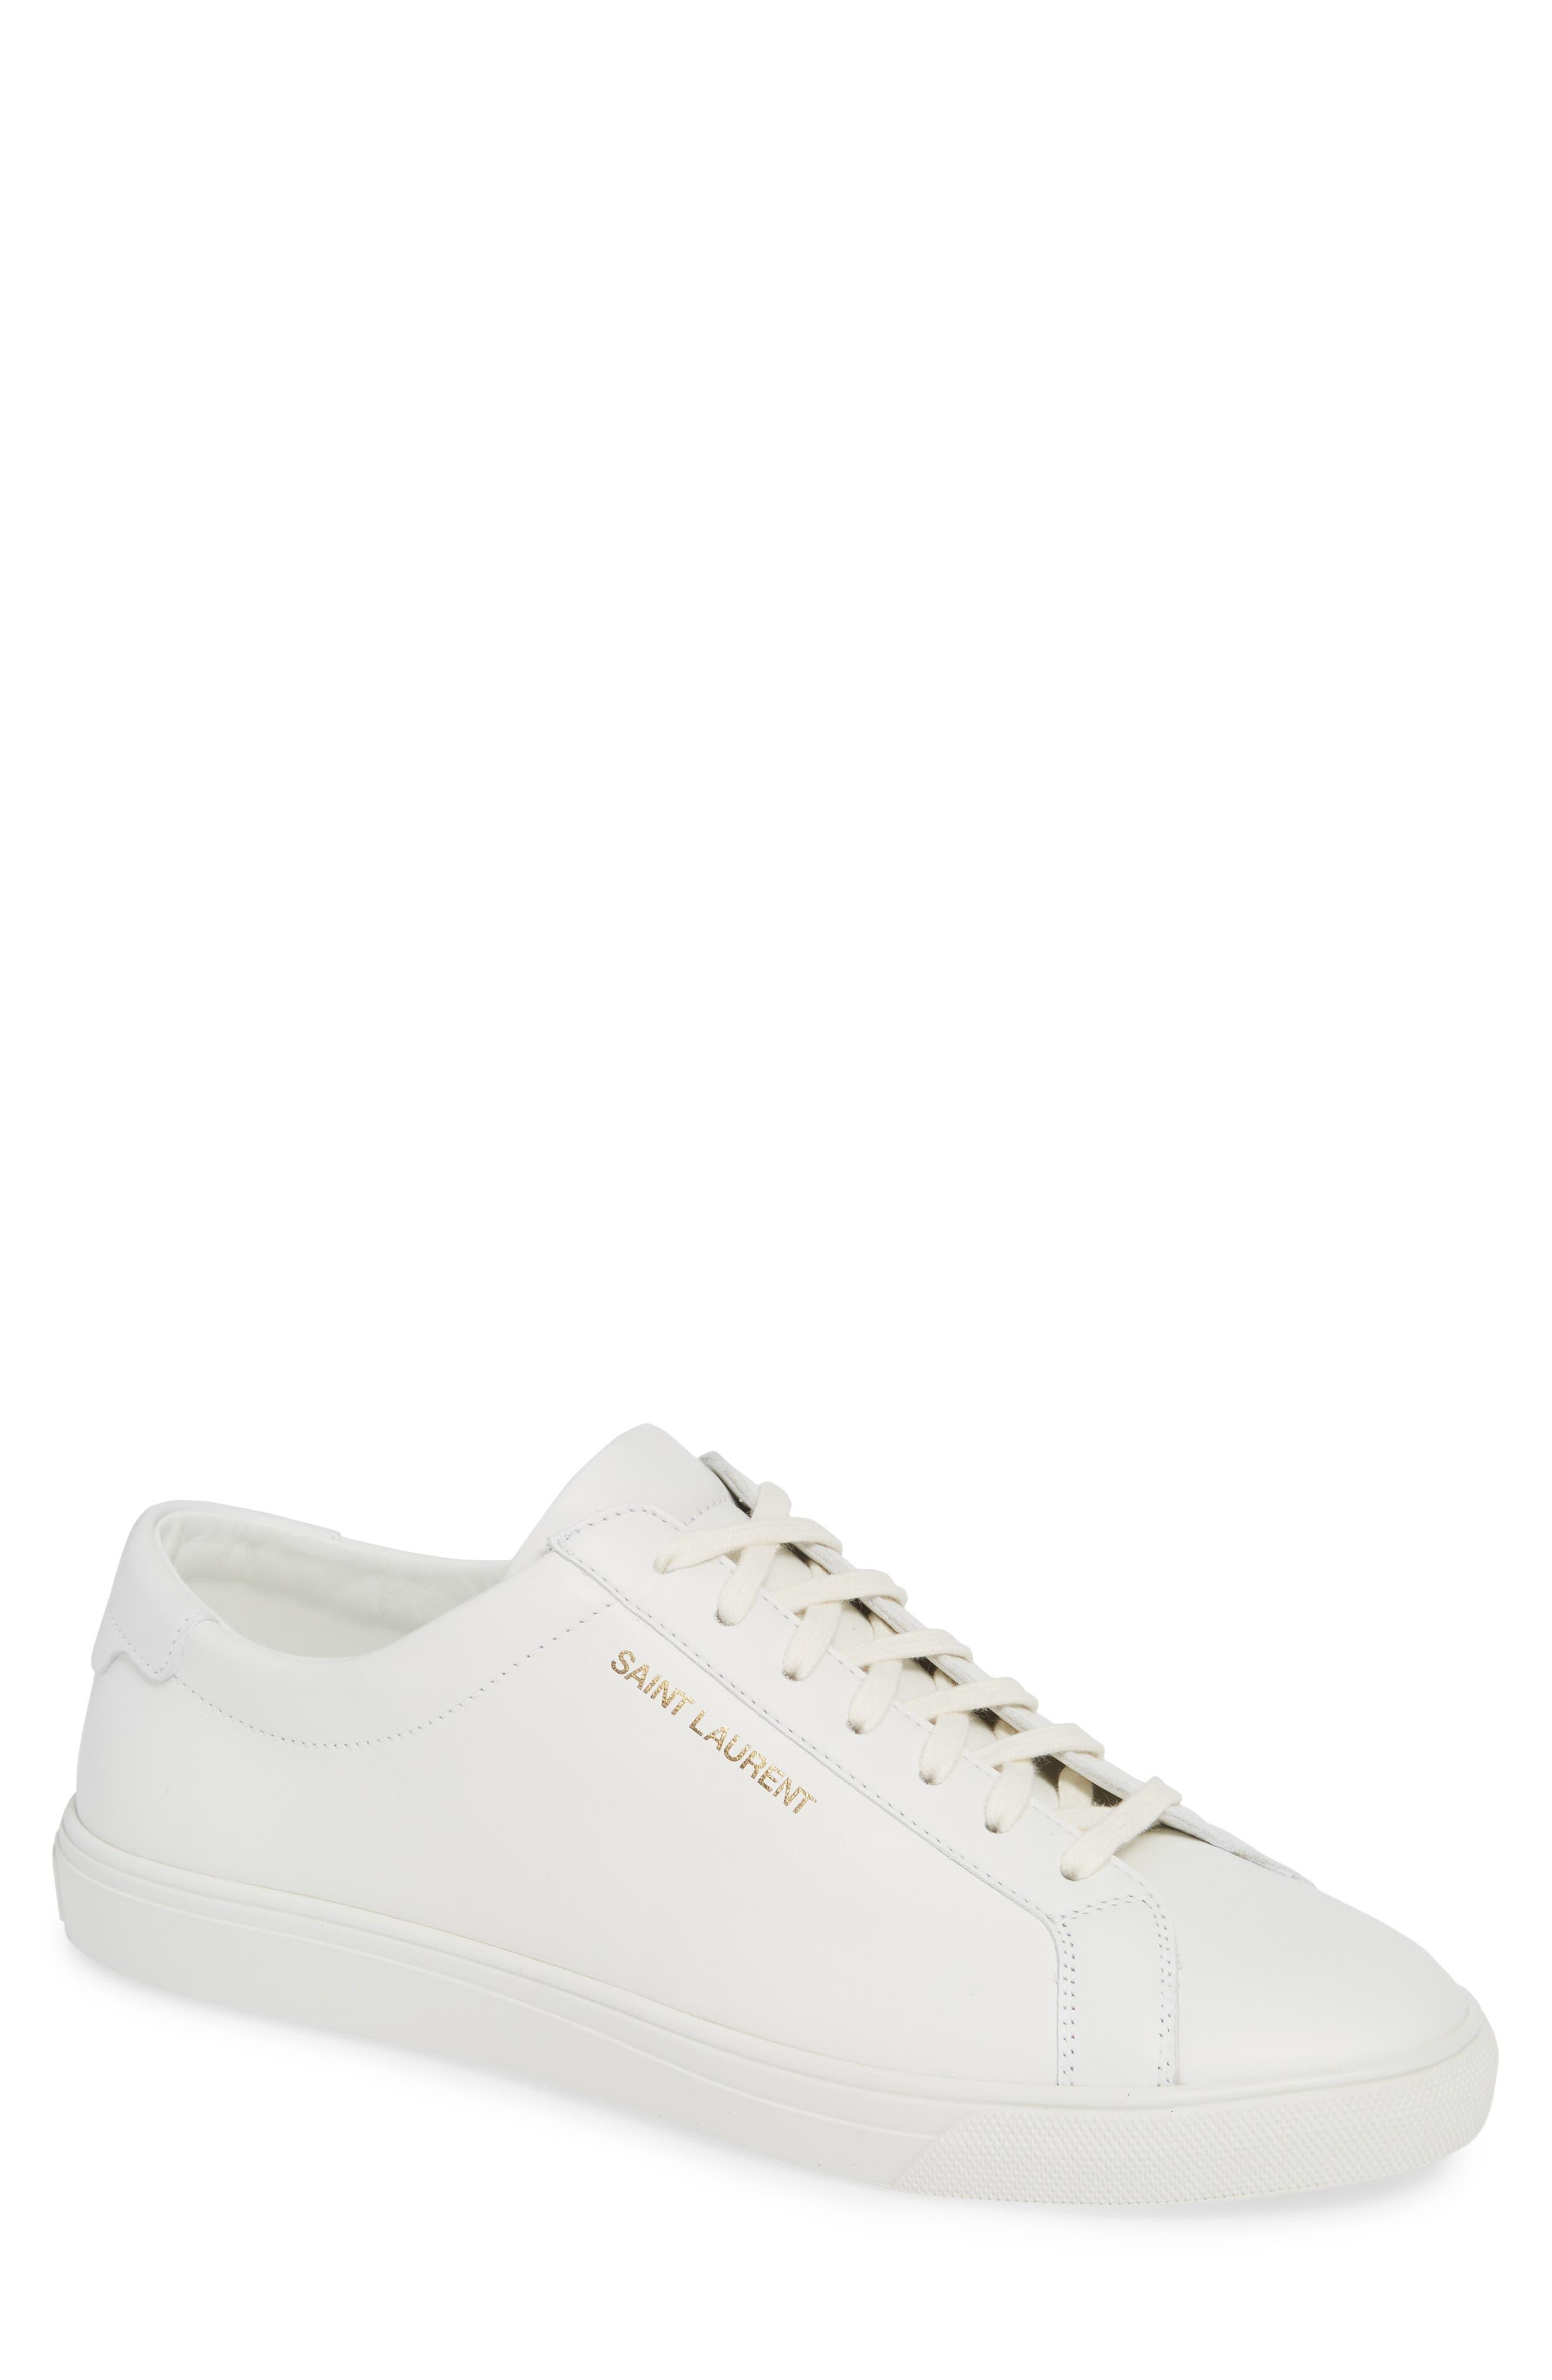 Andy Low Top Sneaker,                             Main thumbnail 1, color,                             BLANC OPTIQUE